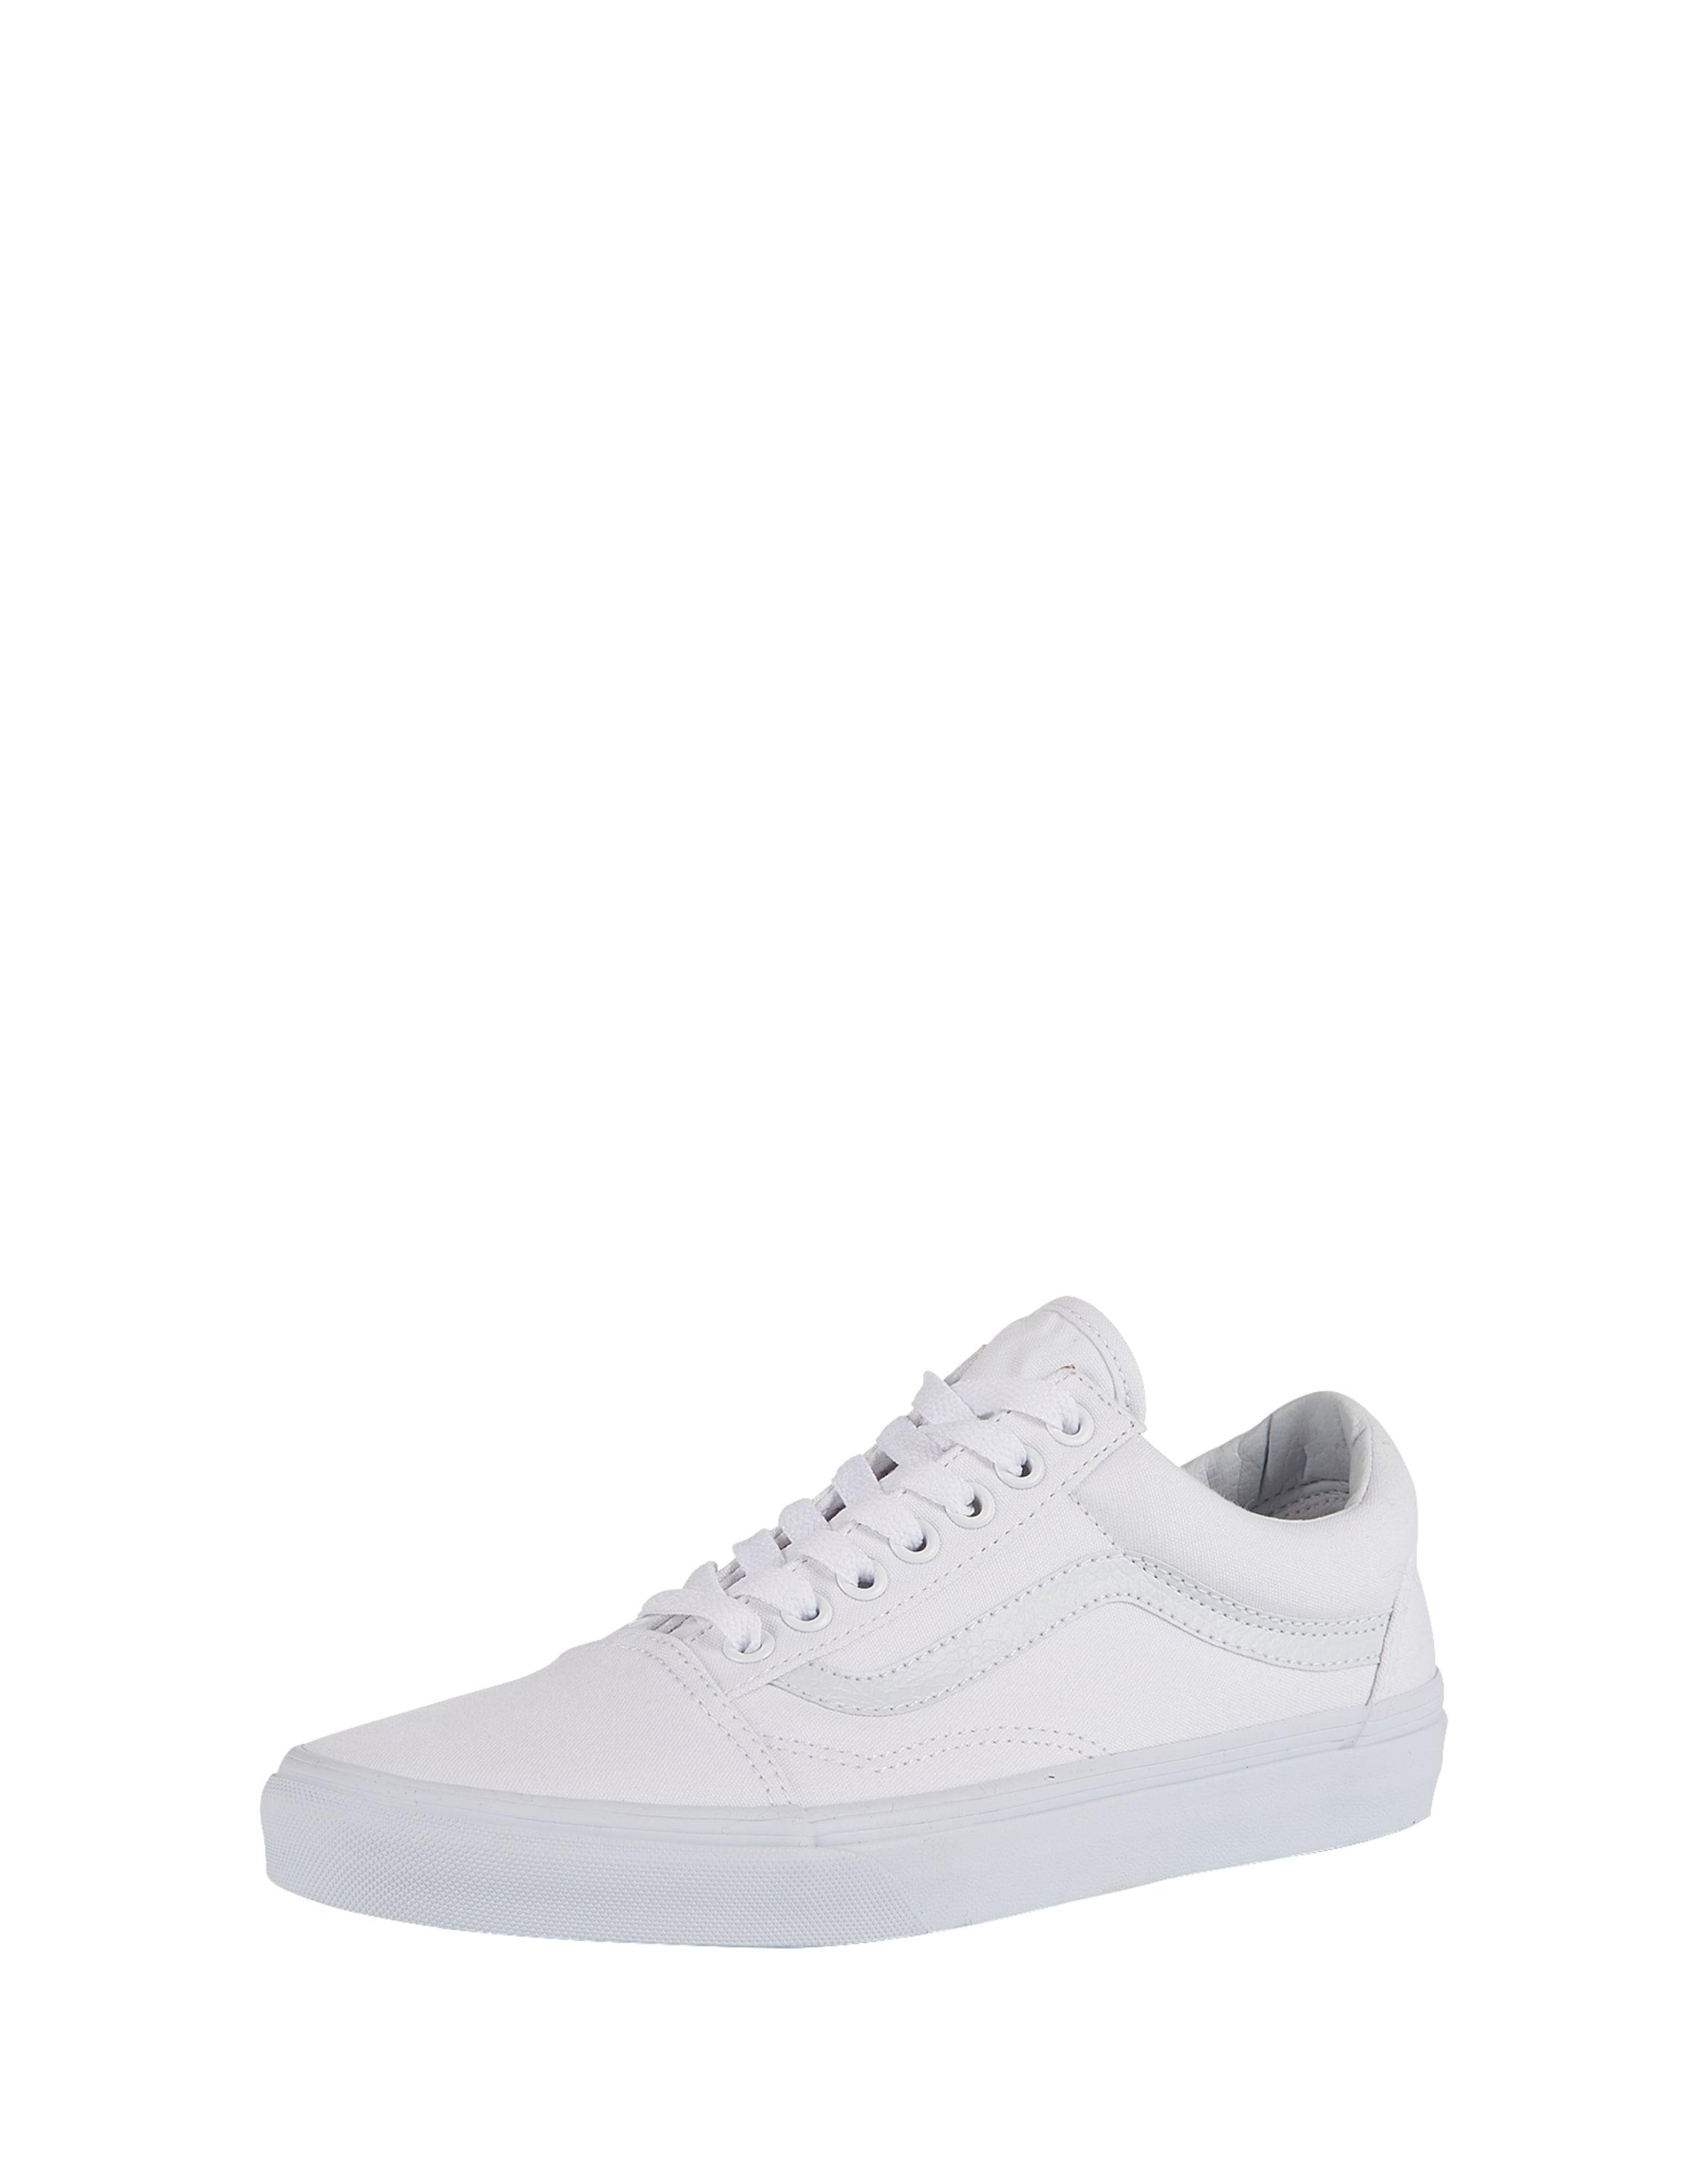 VANS Verschleißfeste Sneaker Verschleißfeste VANS billige Schuhe Hohe Qualität 6b8a3a